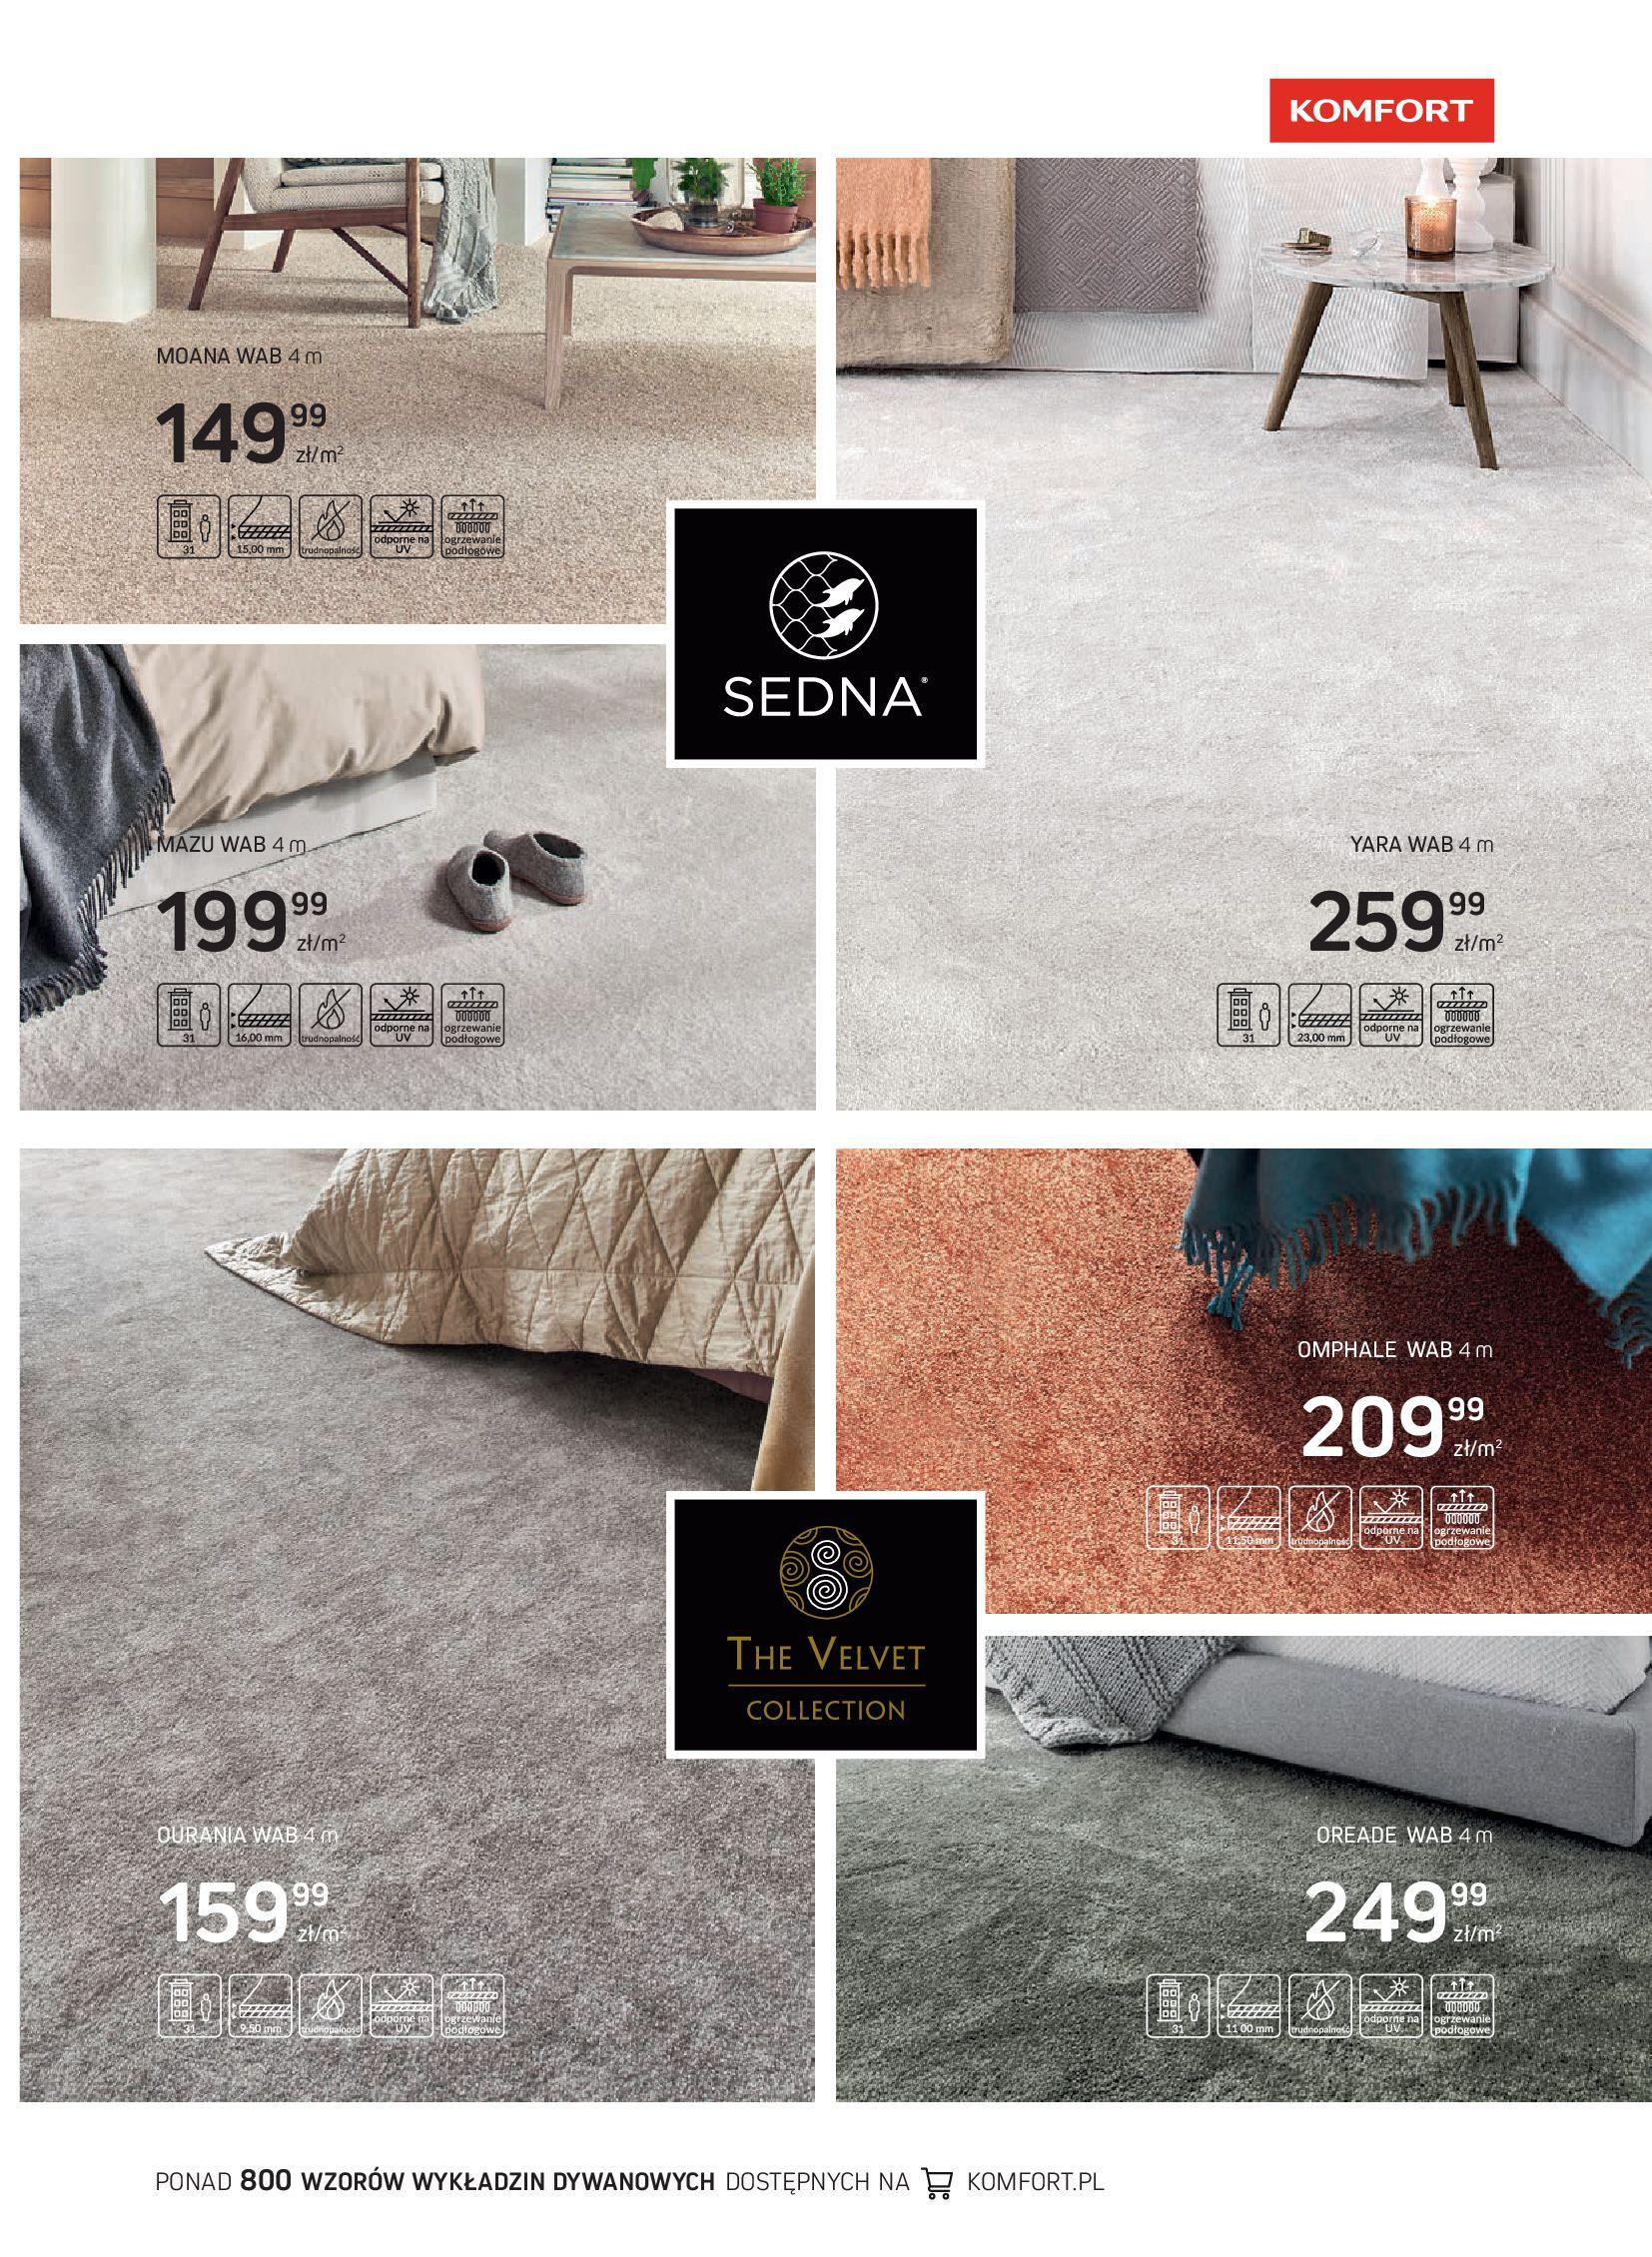 Gazetka Komfort: Gazetka Komfort - Katalog podłogi i drzwi 2021-06-16 page-43